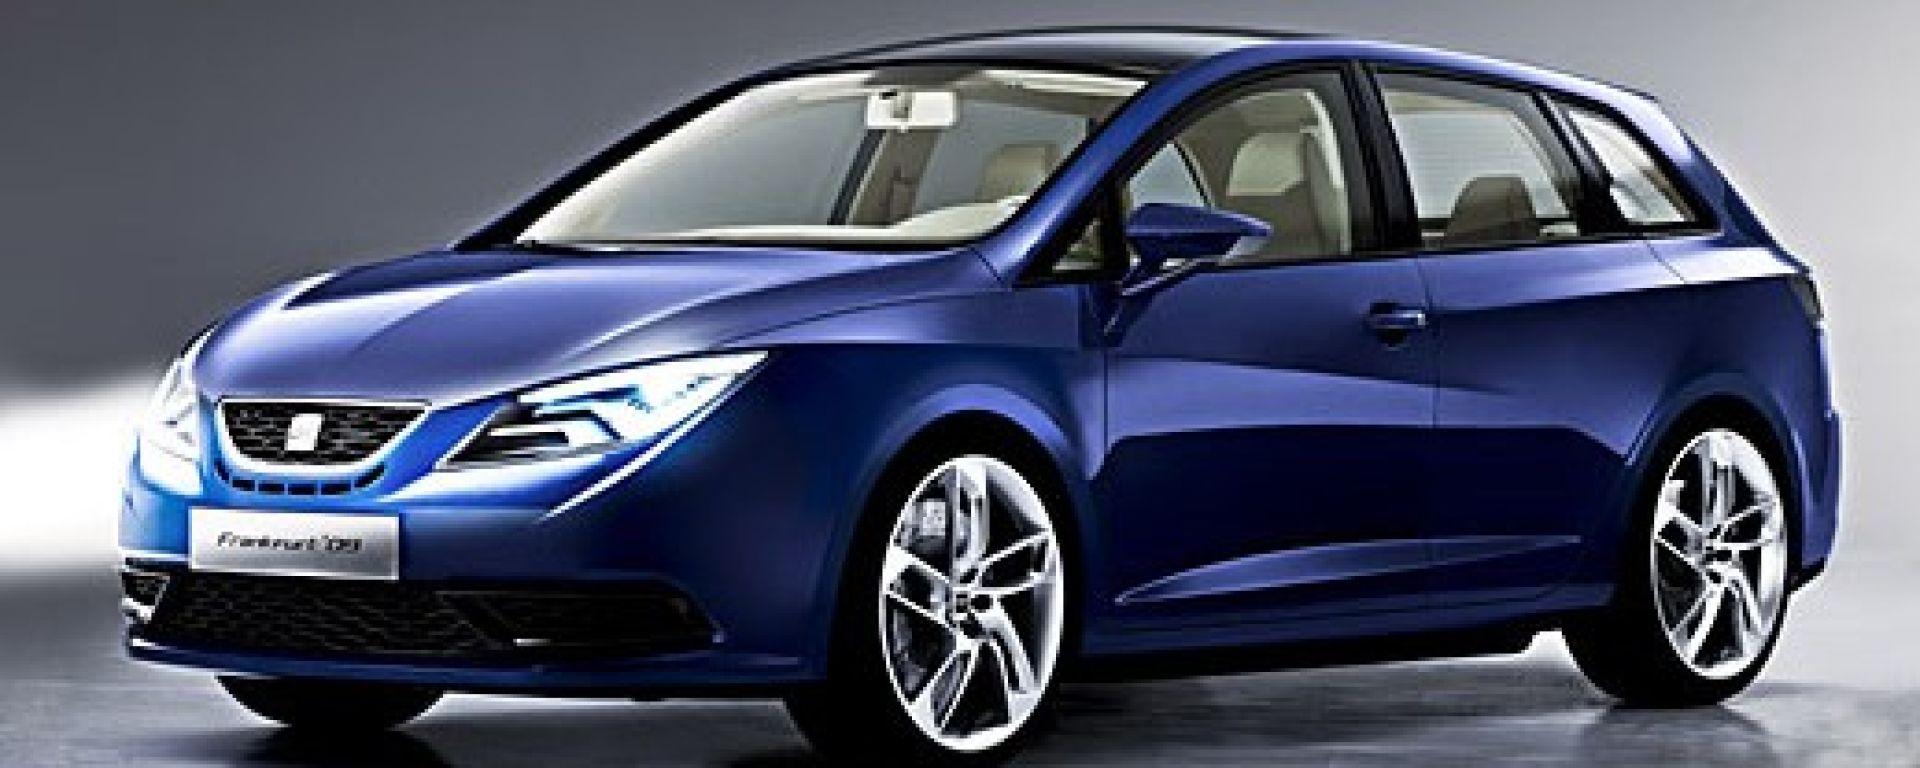 Seat Ibiza Concept